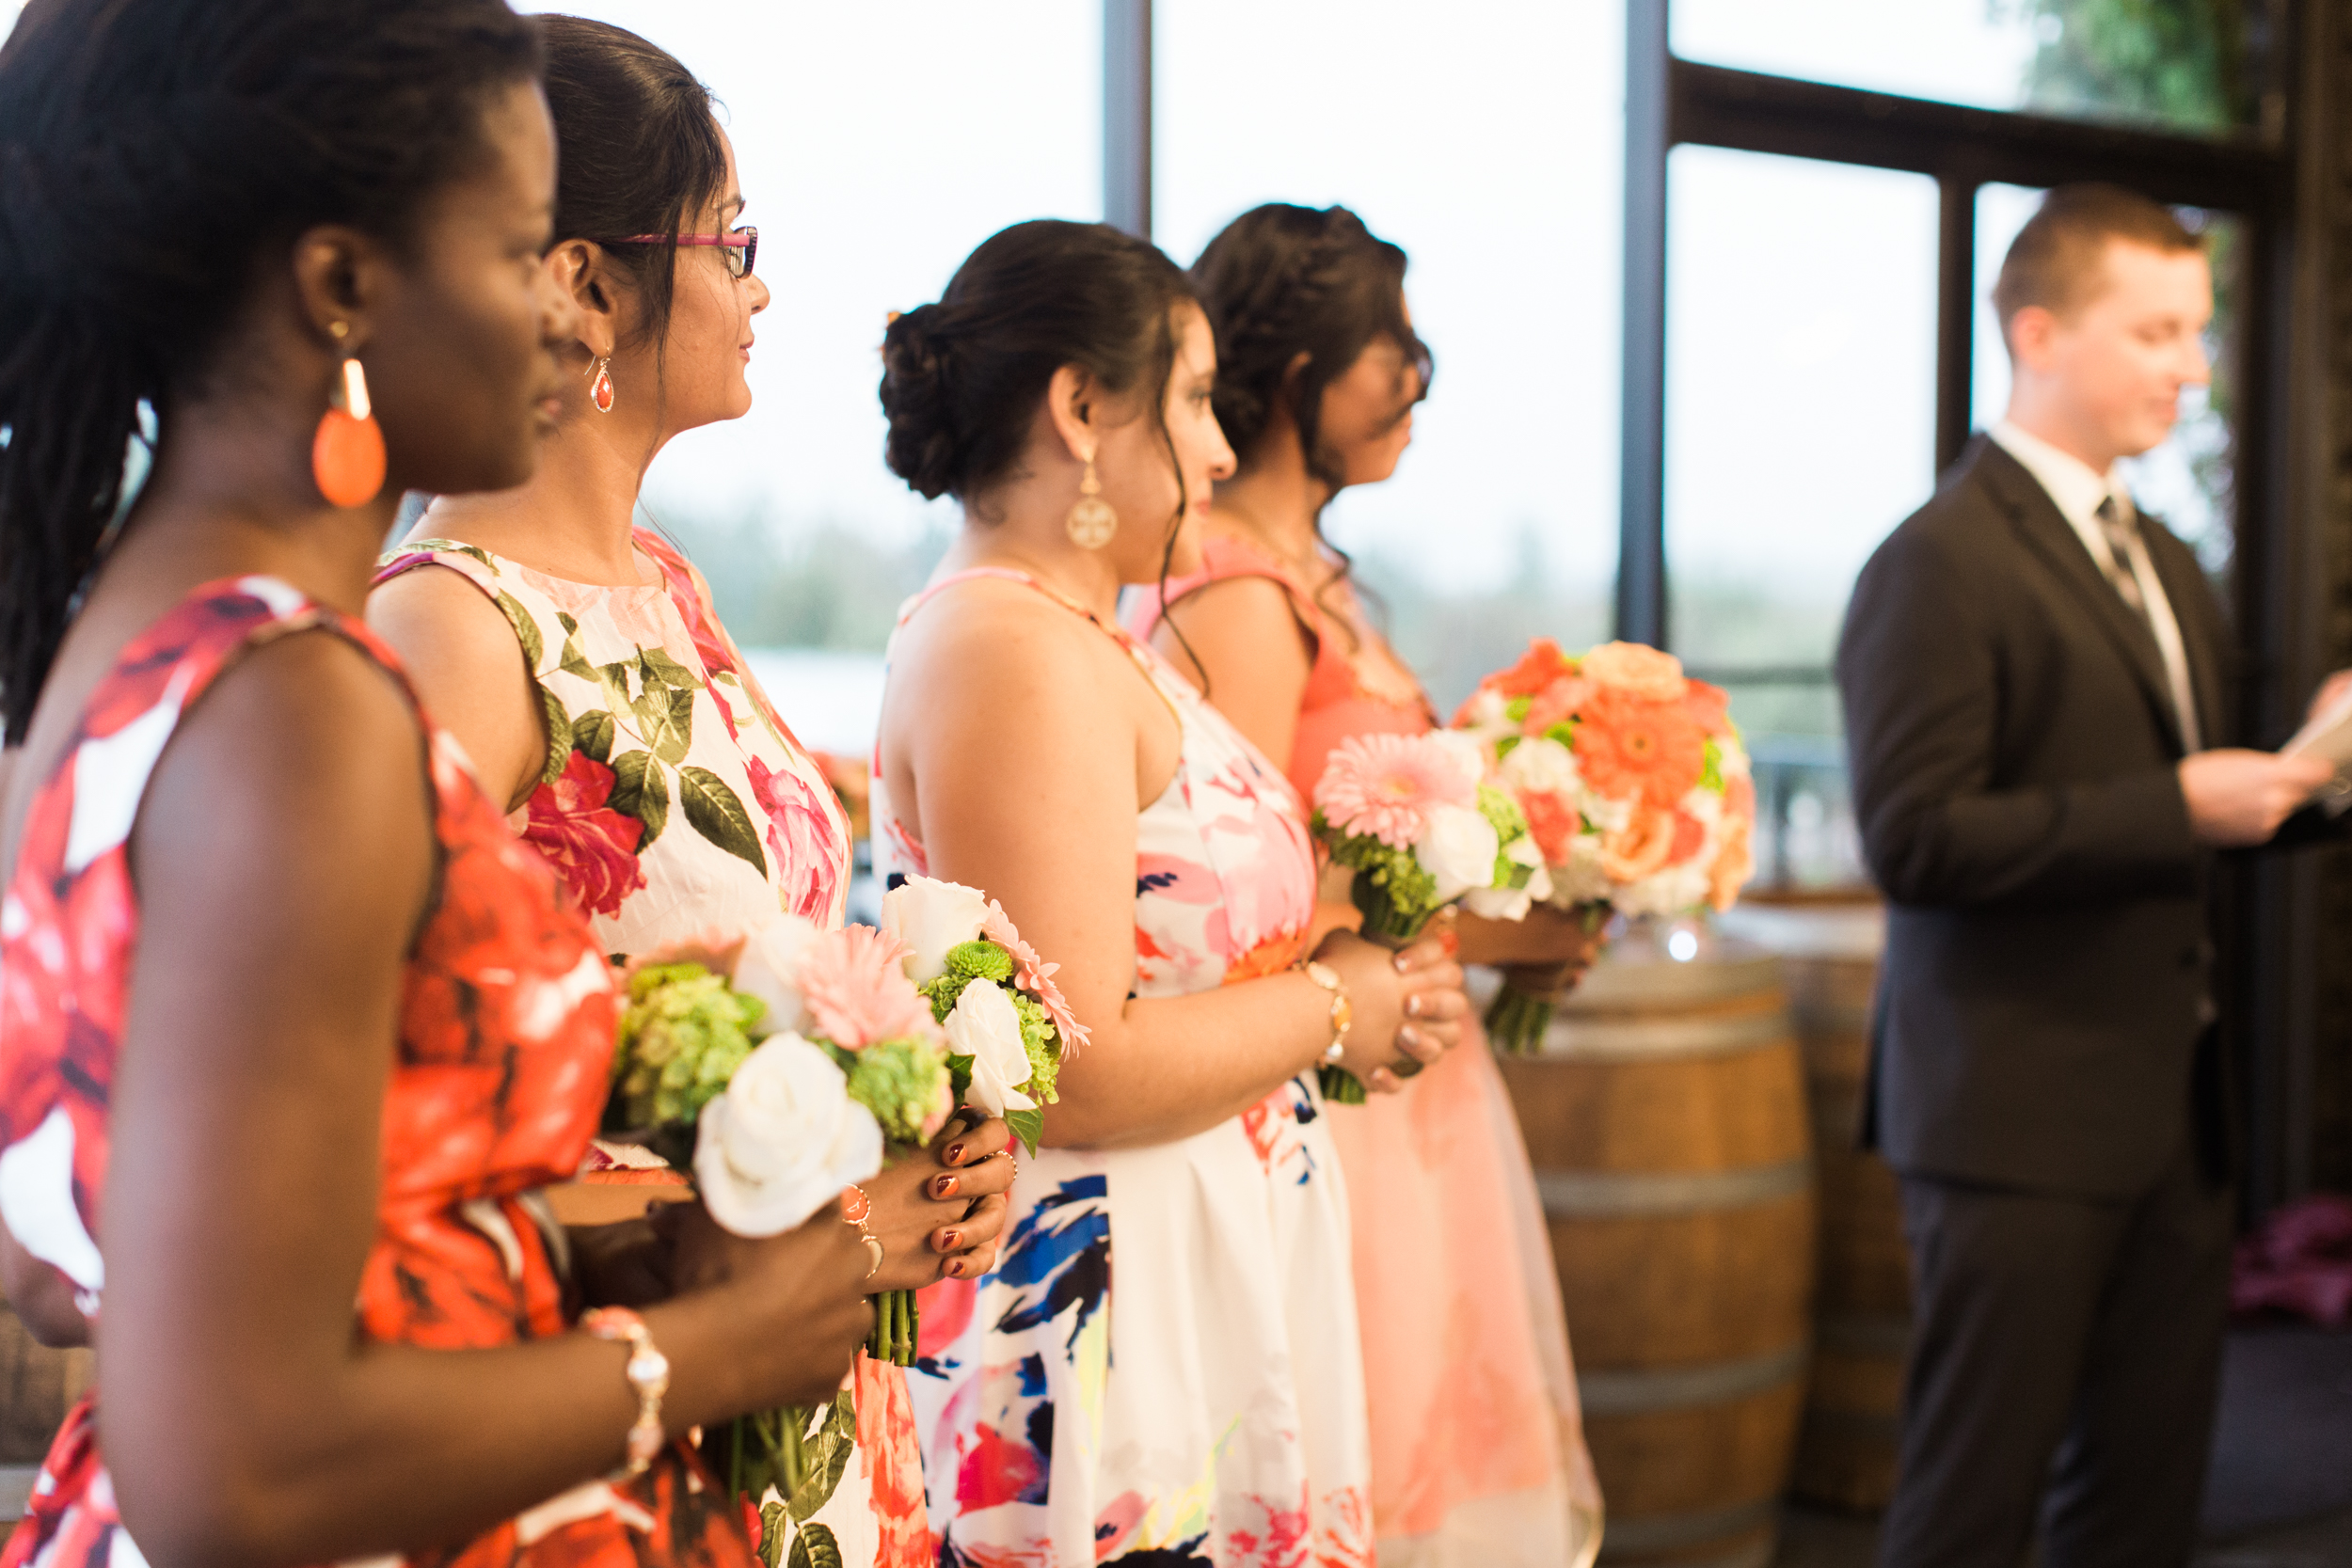 149ad-messina-hof-wedding-36messina-hof-wedding-36.jpg